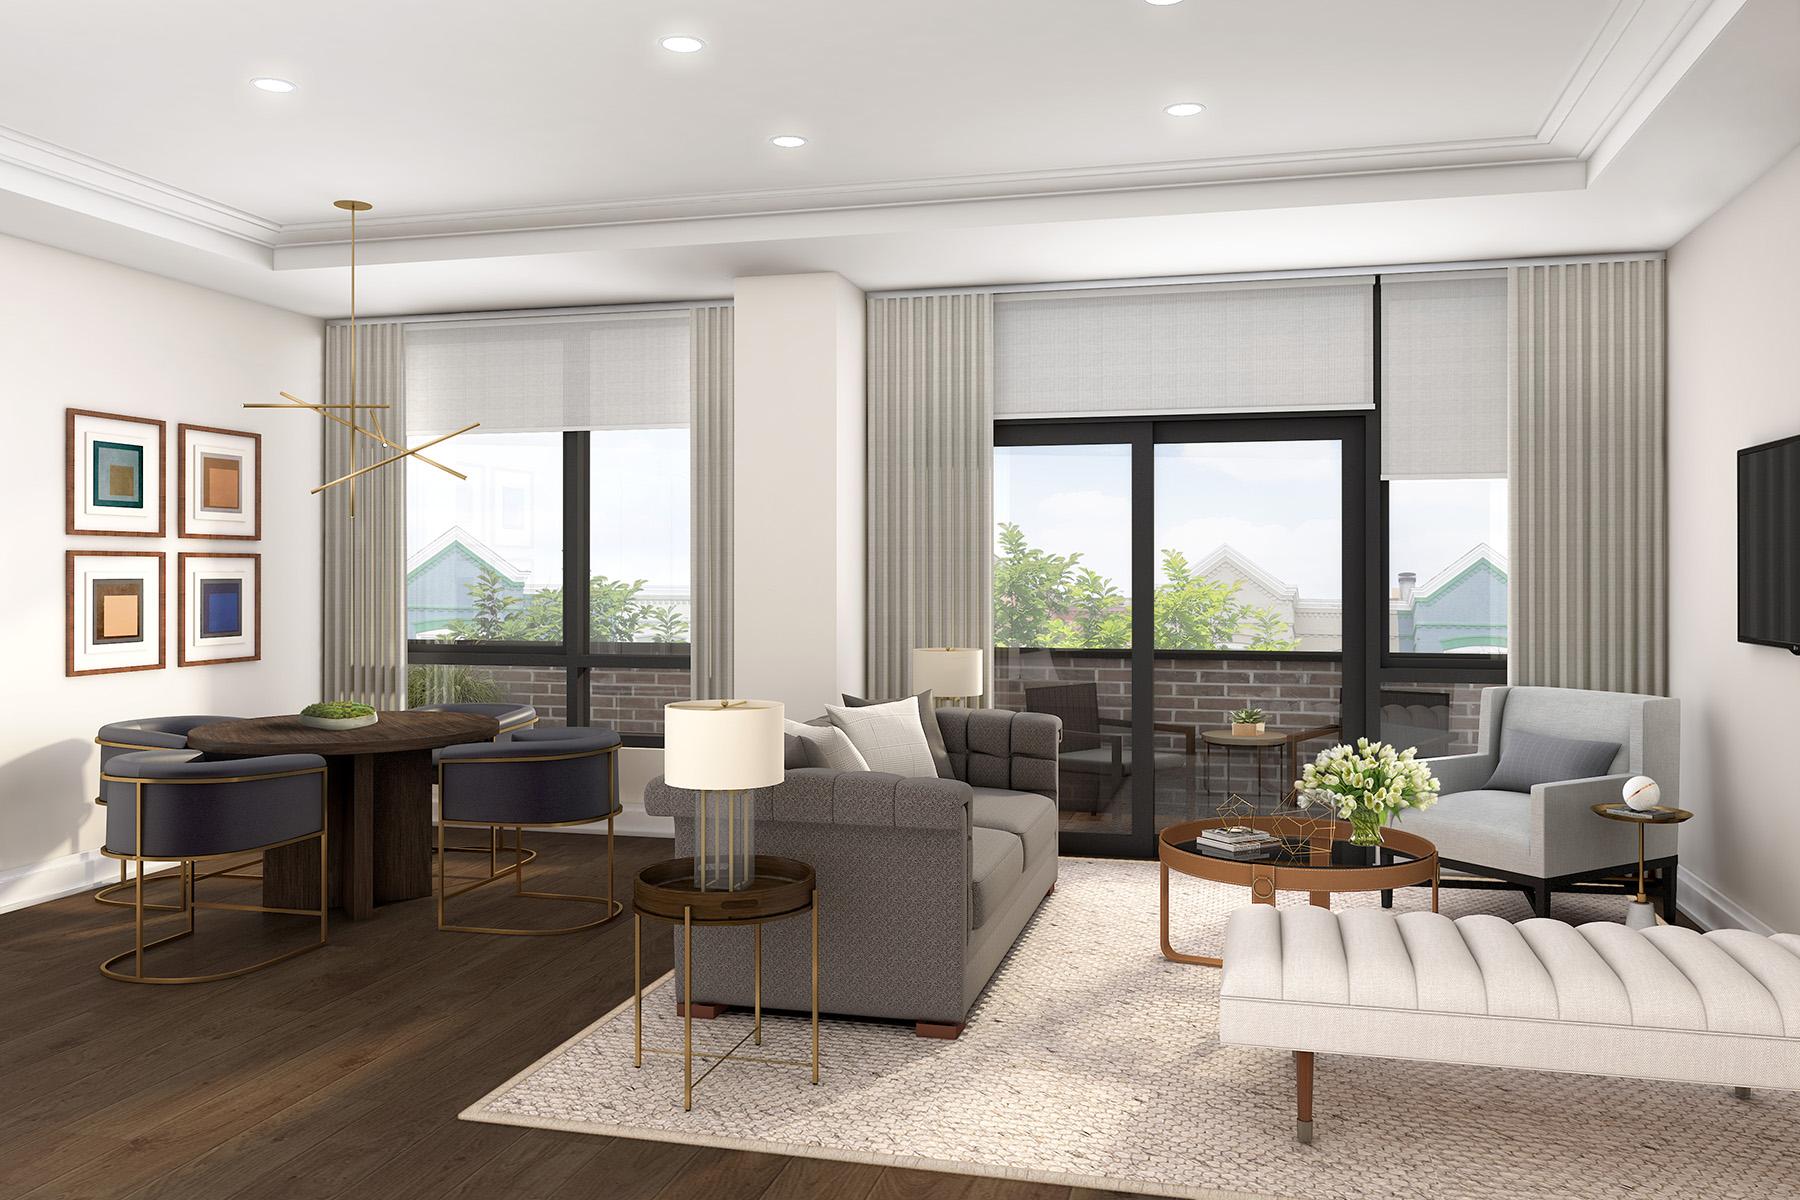 08 Unit 406 Living Room 2018.jpg